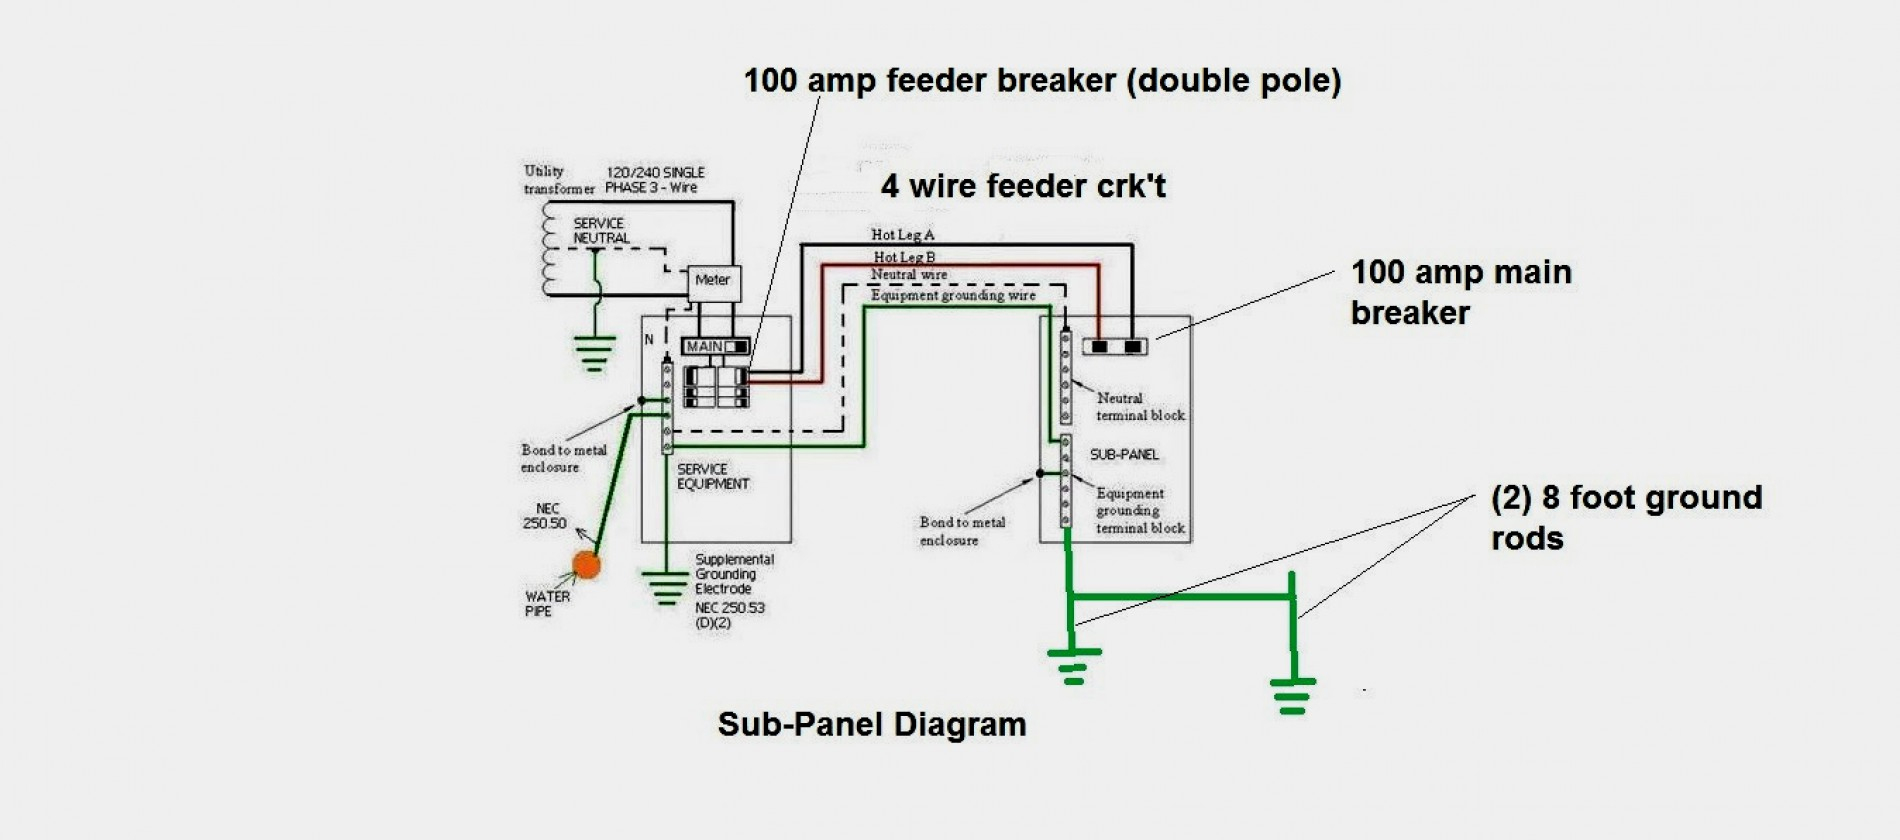 Typical Wiring Diagrams Swimming Pool - Data Wiring Diagram Today - Swimming Pool Electrical Wiring Diagram